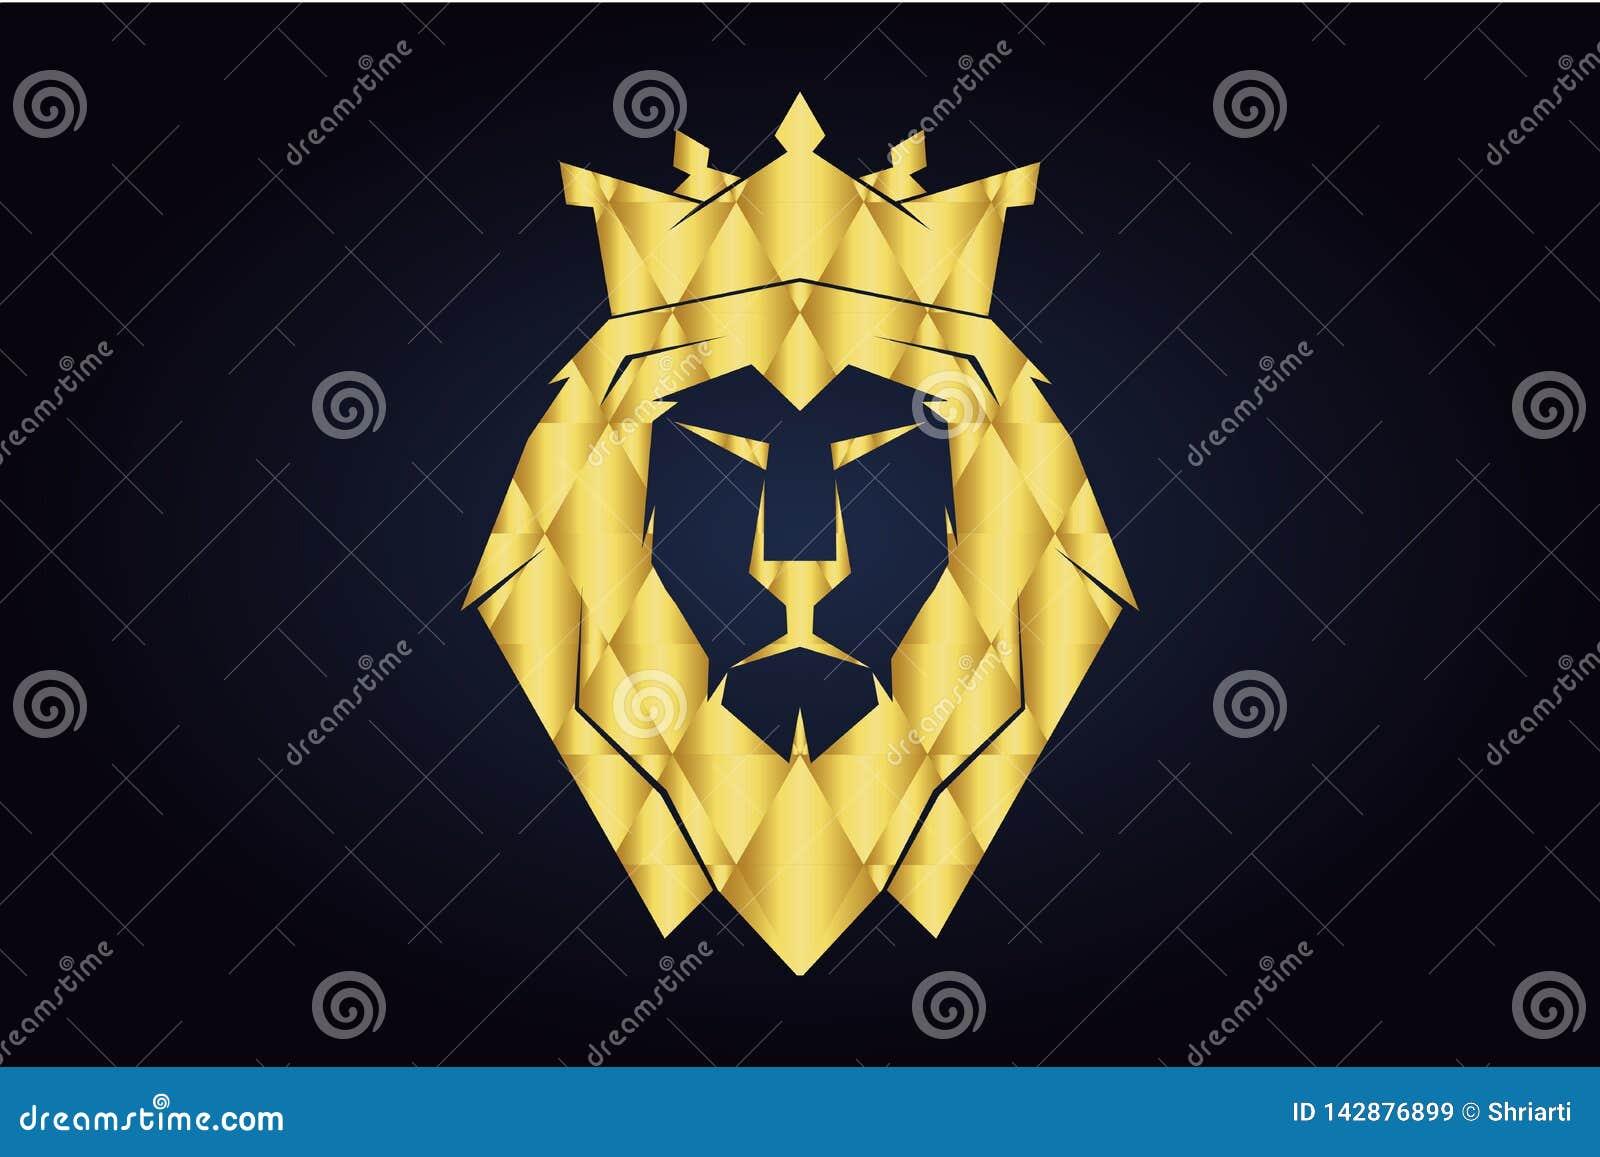 Polygonal κεφάλι λιονταριού με τη χρυσή κορώνα Λιοντάρι βασιλιάδων